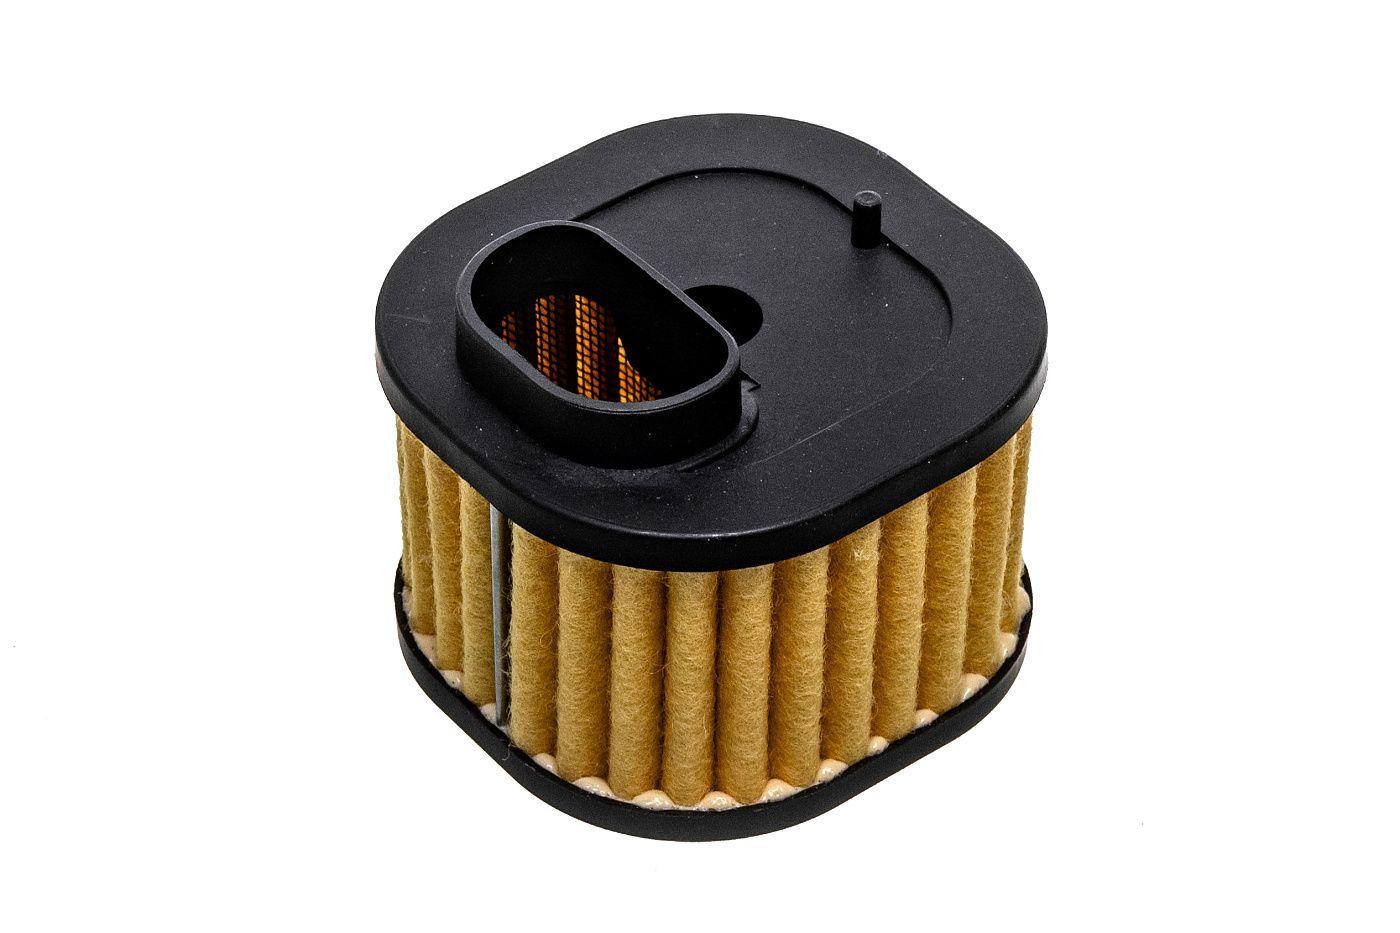 Vzduchový filter typ 2 Husqvarna 362 365 371 372 Jonsered CS2165 CS2165 EPA